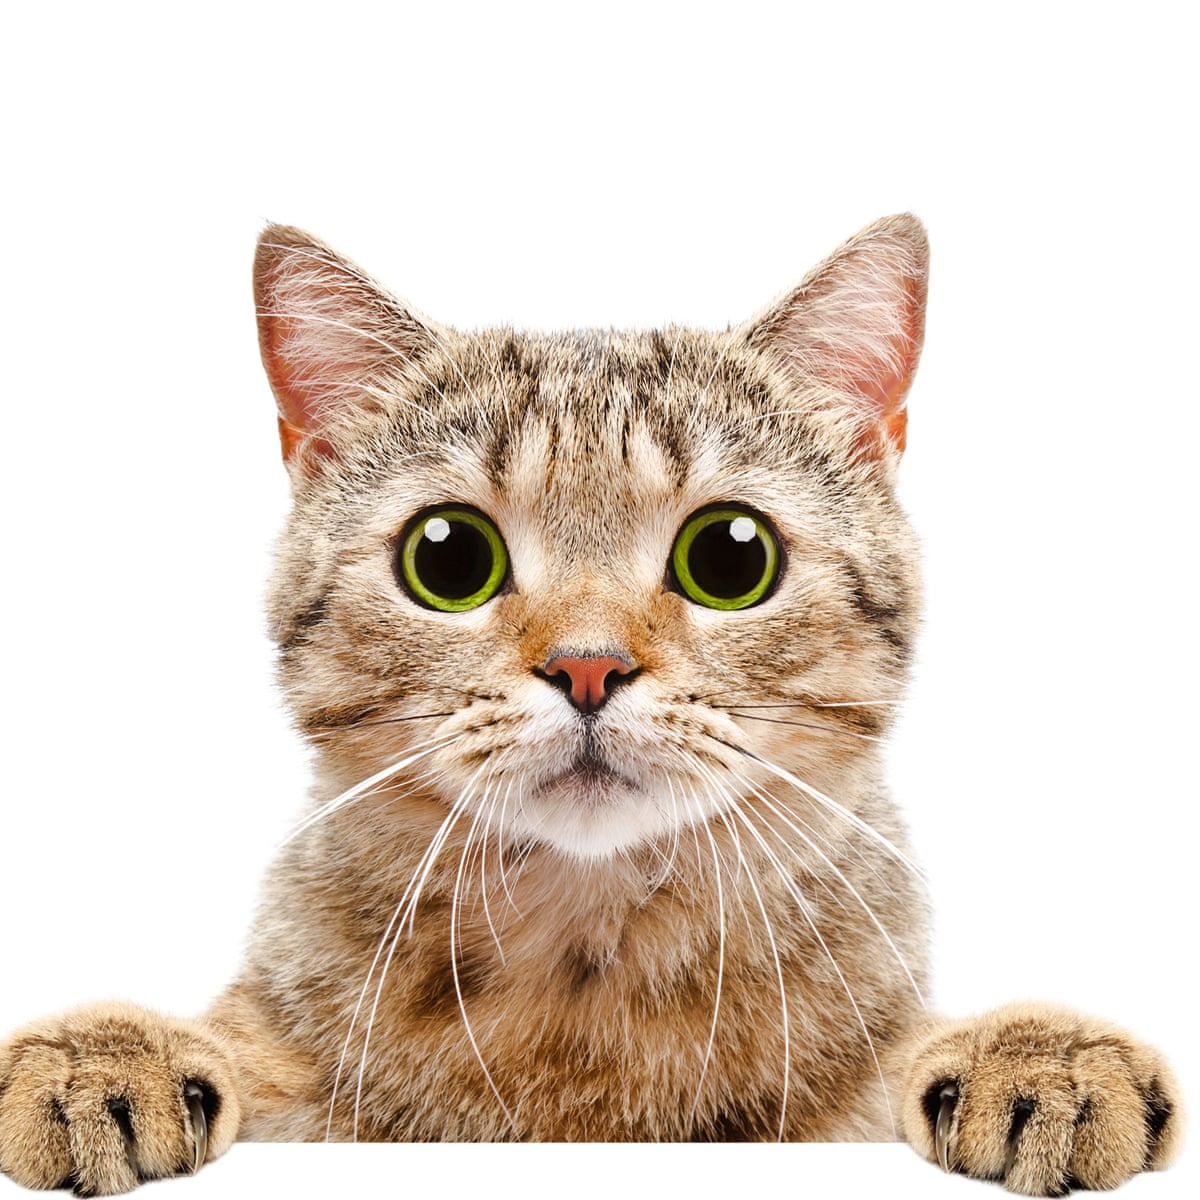 Download Adorable Cat Pictures Photos Images dh9zW9Ce1